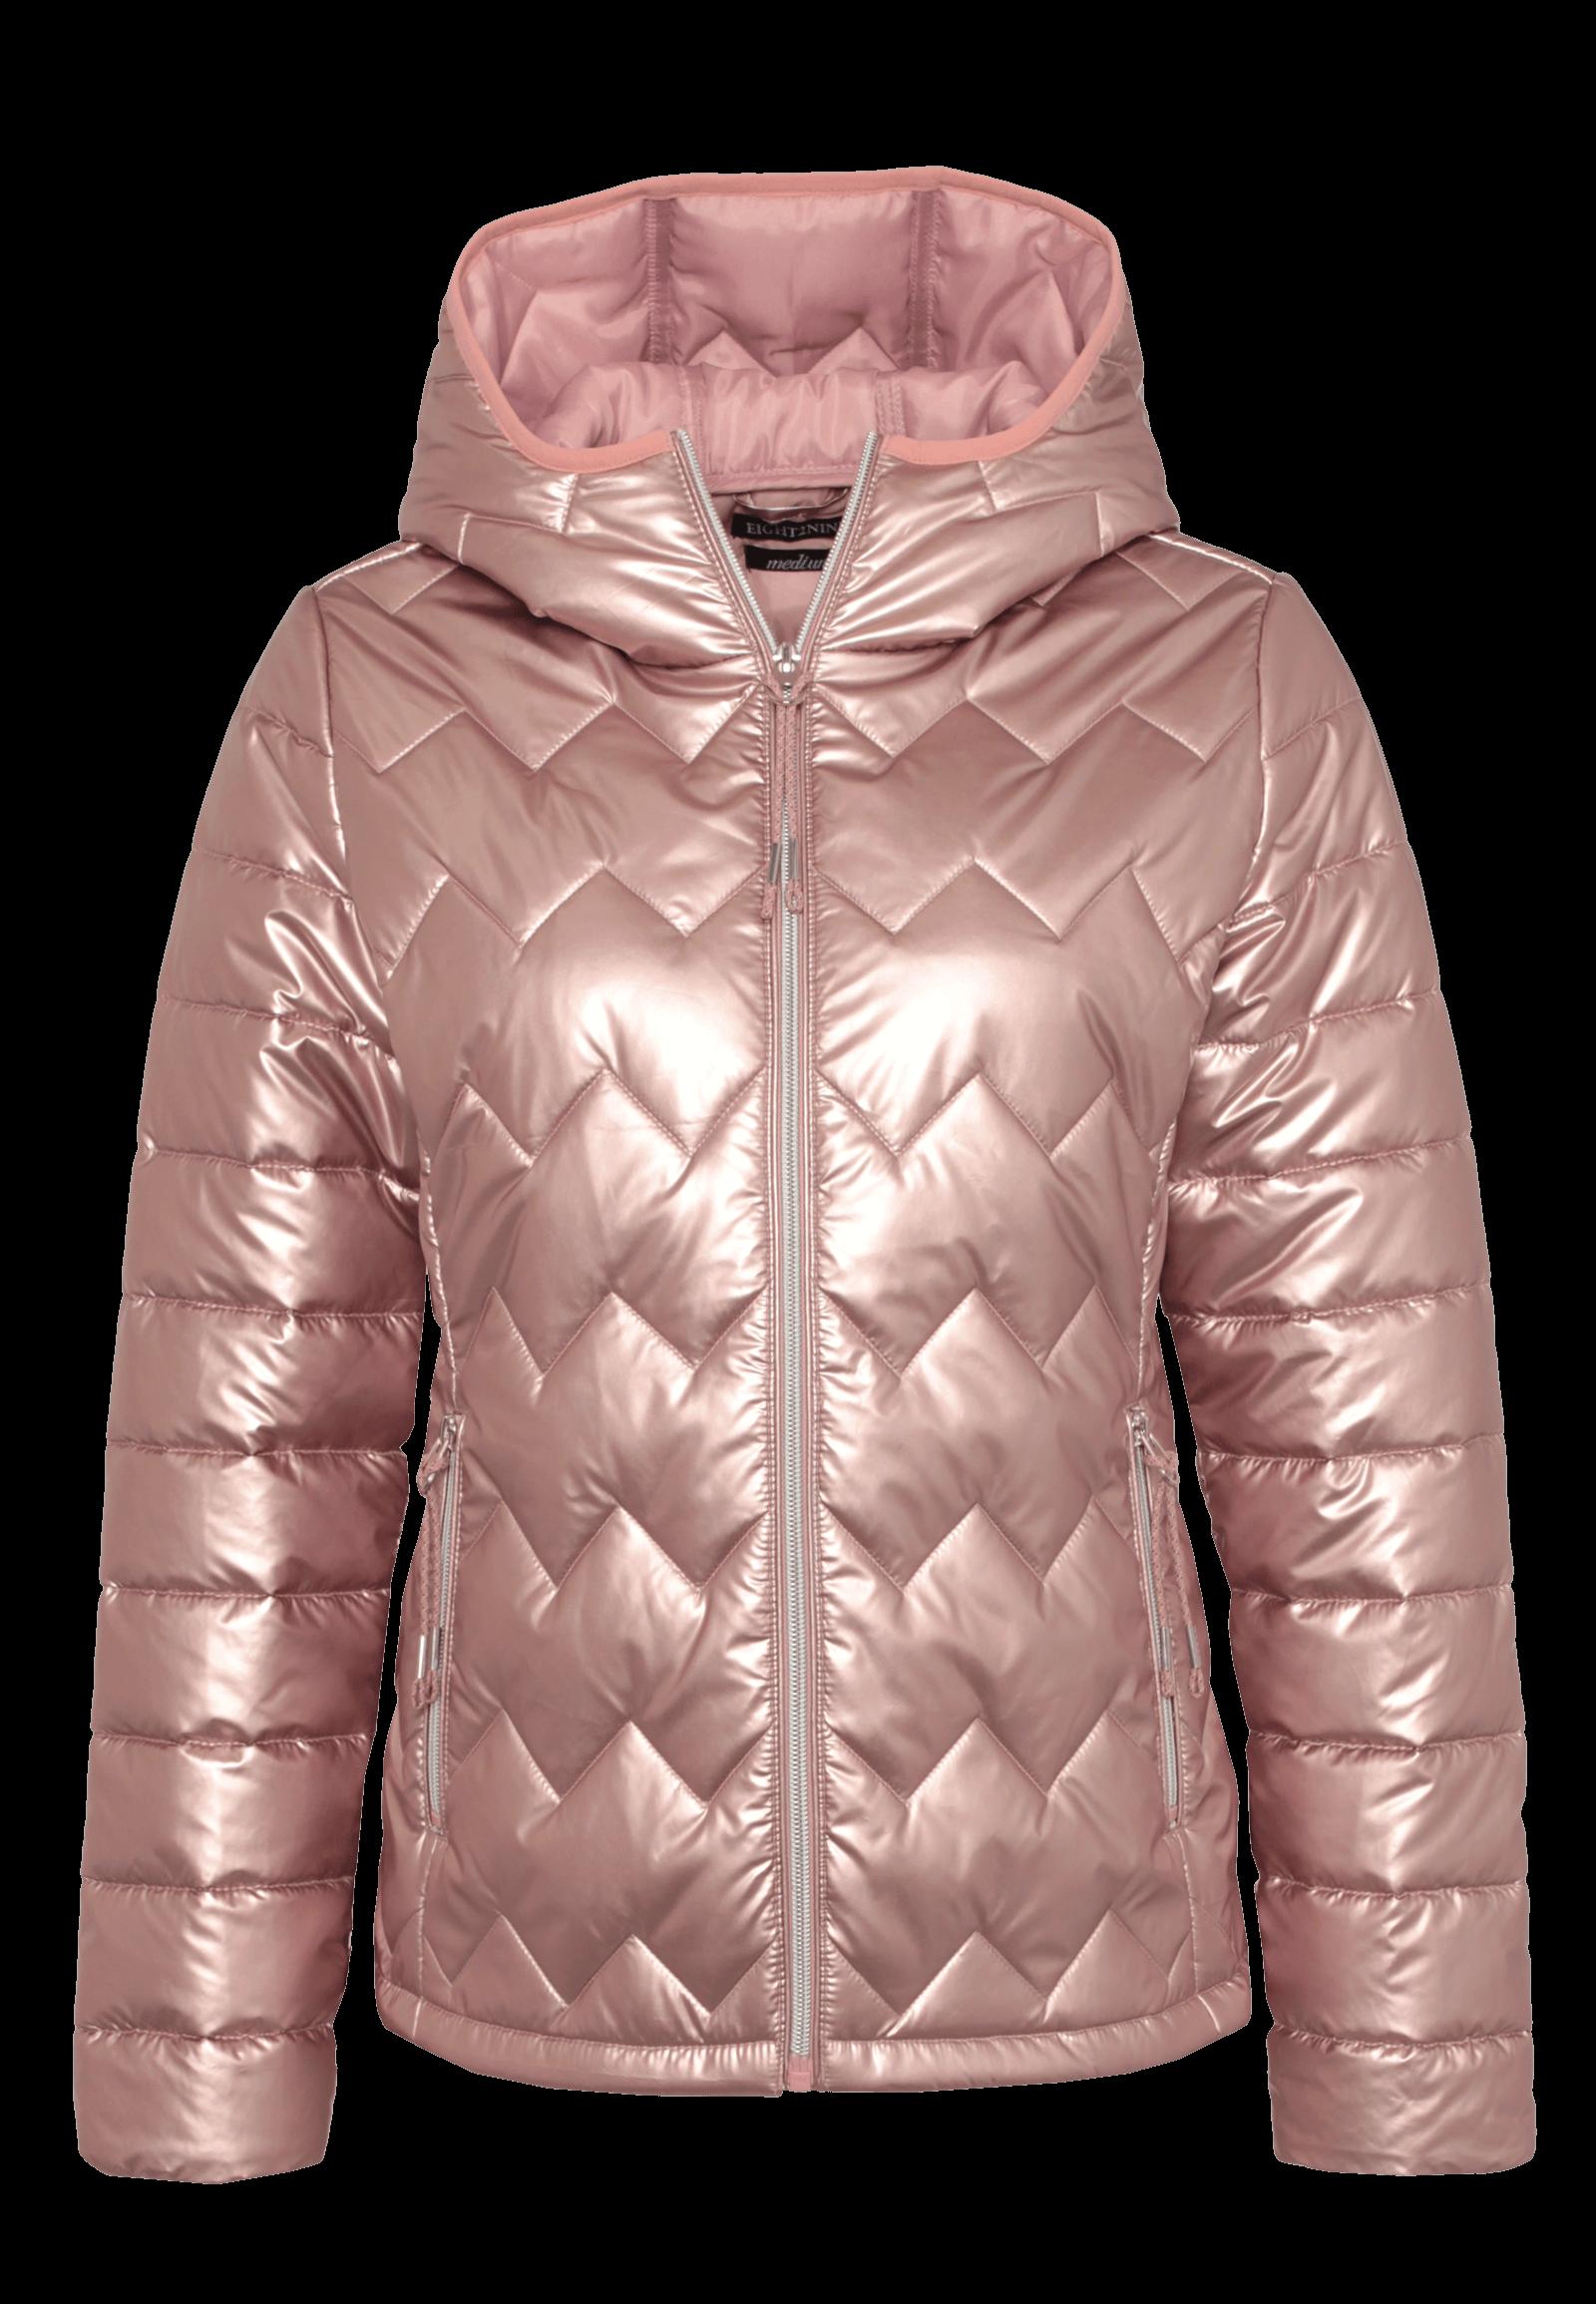 Winterjacke metallic